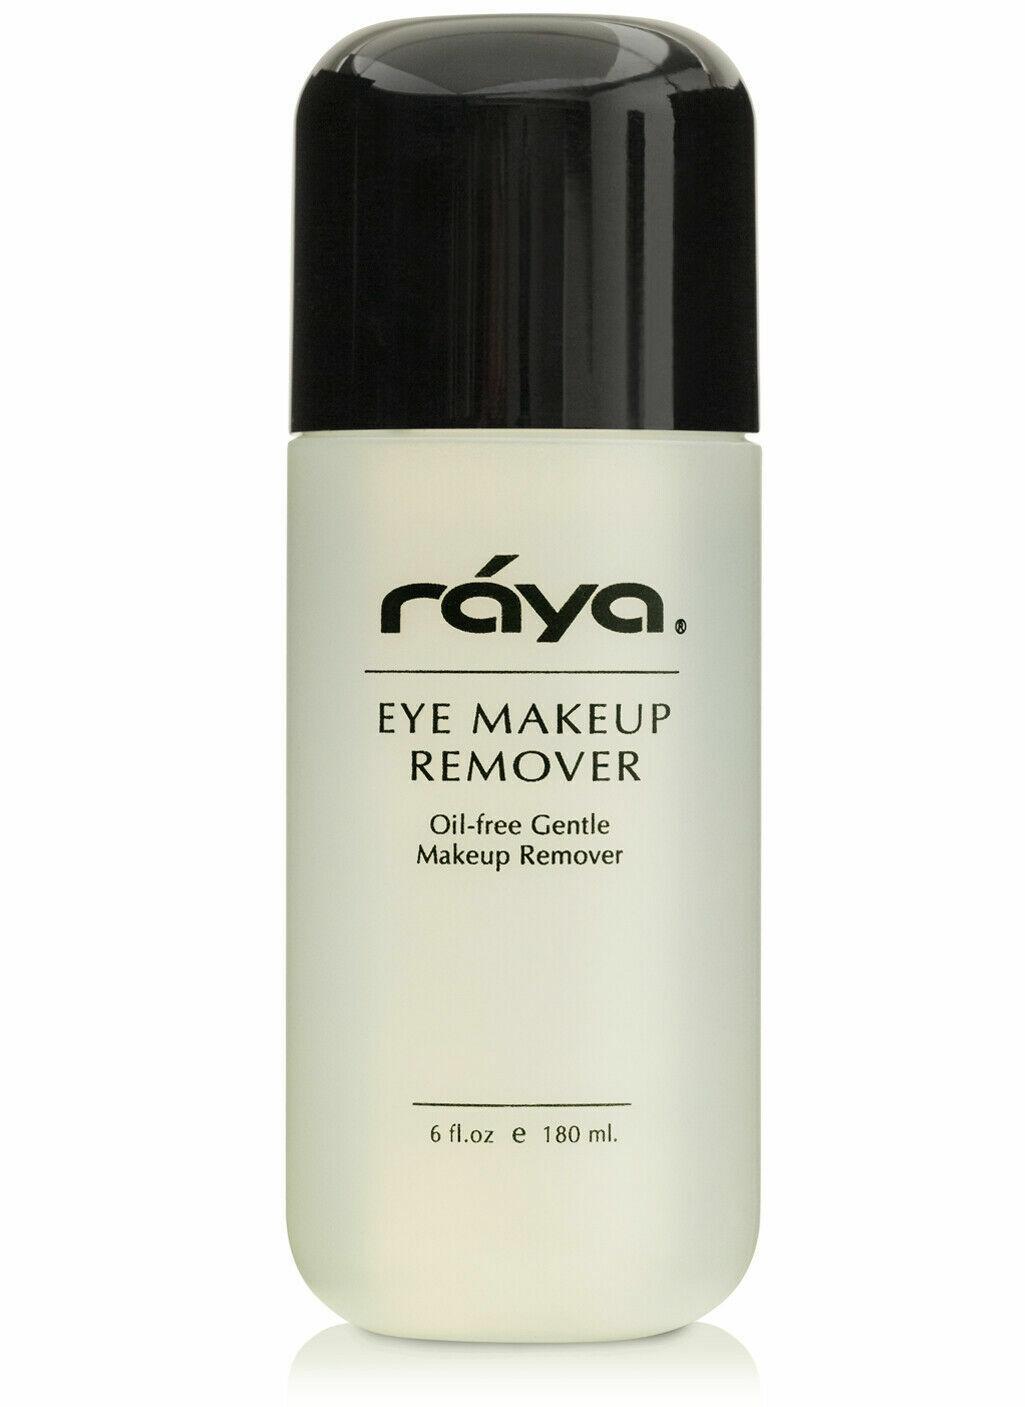 Eye Make-Up Remover  | RAYA - Skin Concerns - dryness & dehy